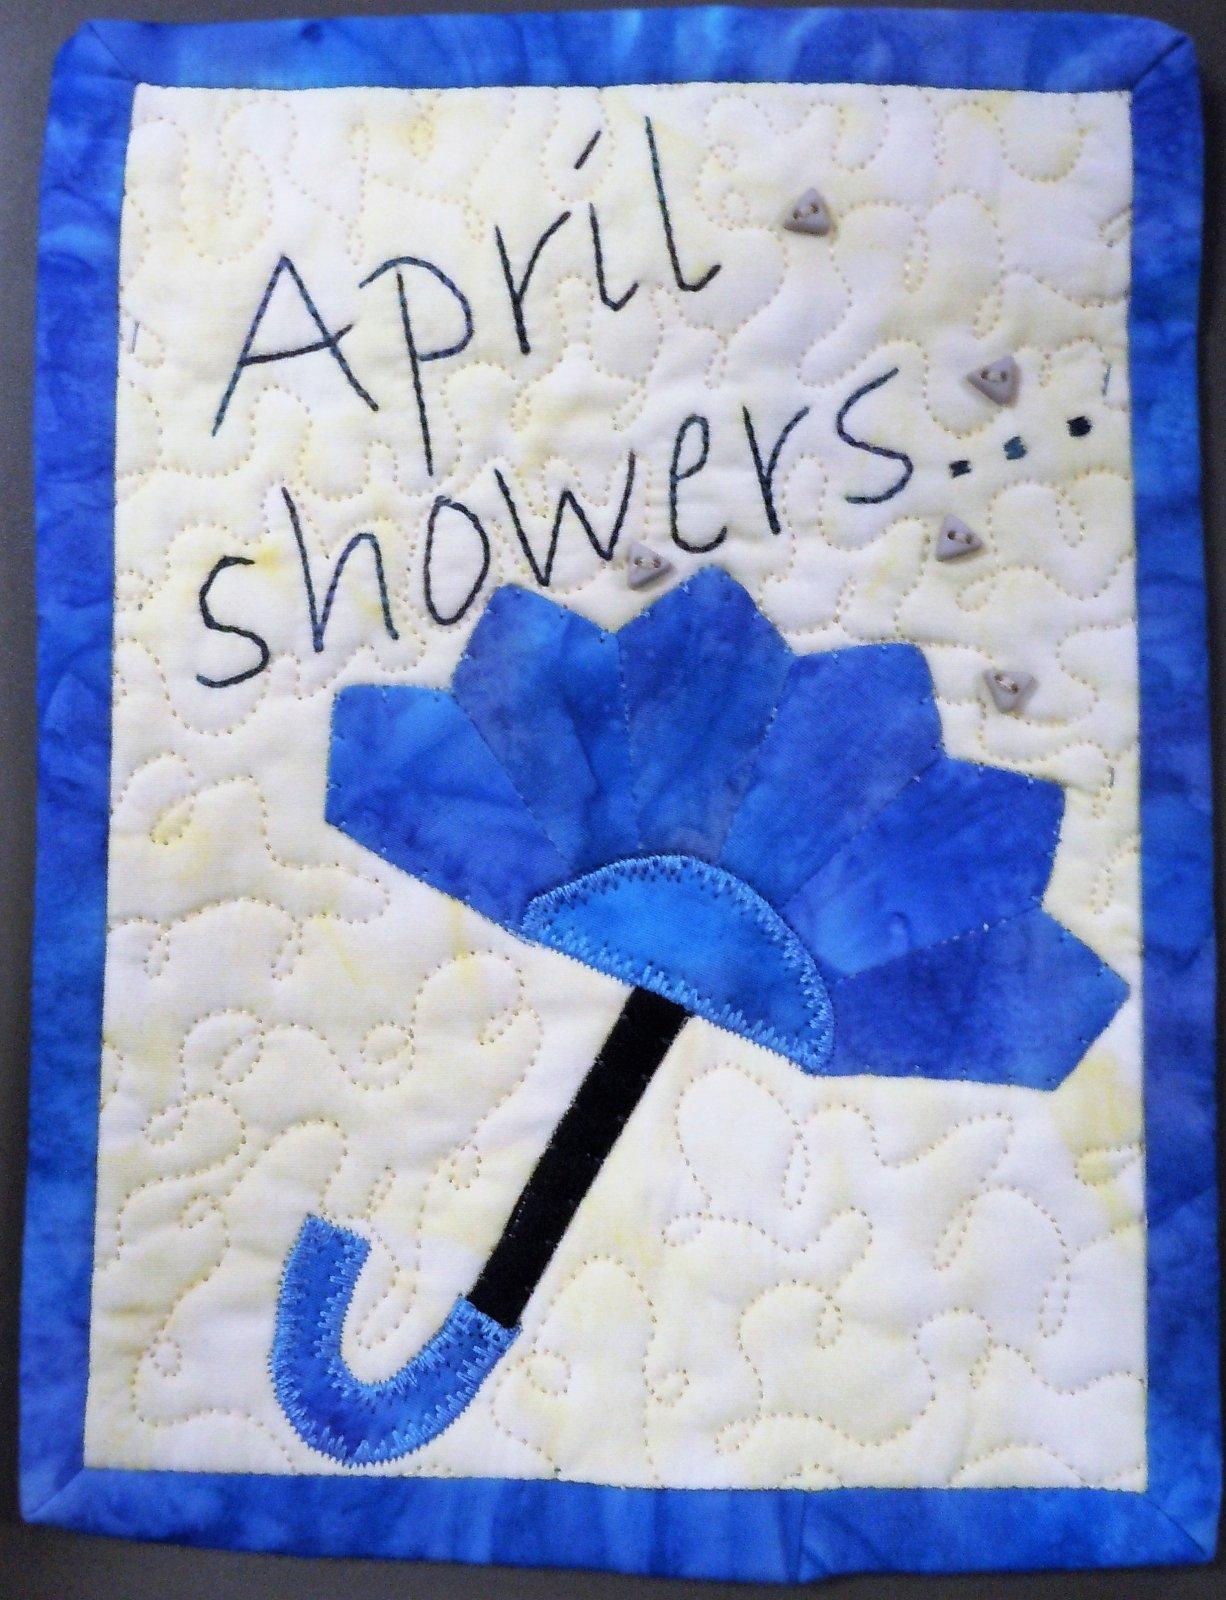 Kit-Tiny Dresden Apr Umbrella 6W x 8H